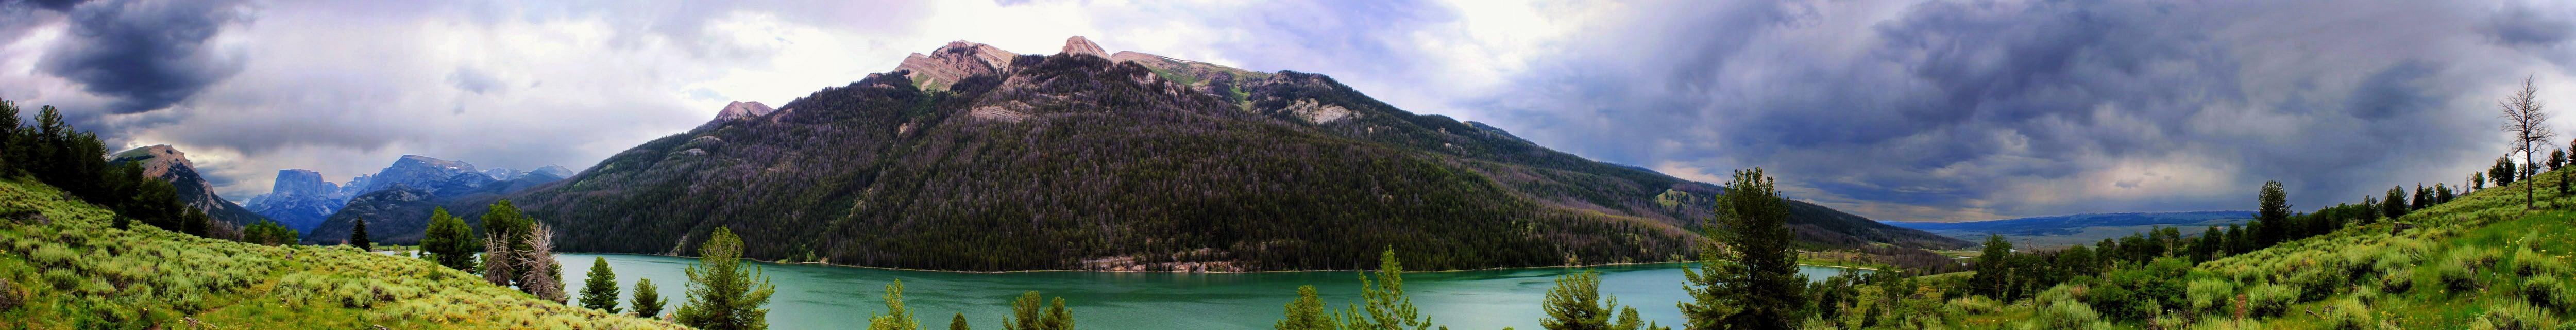 Panorama of Green River Lake